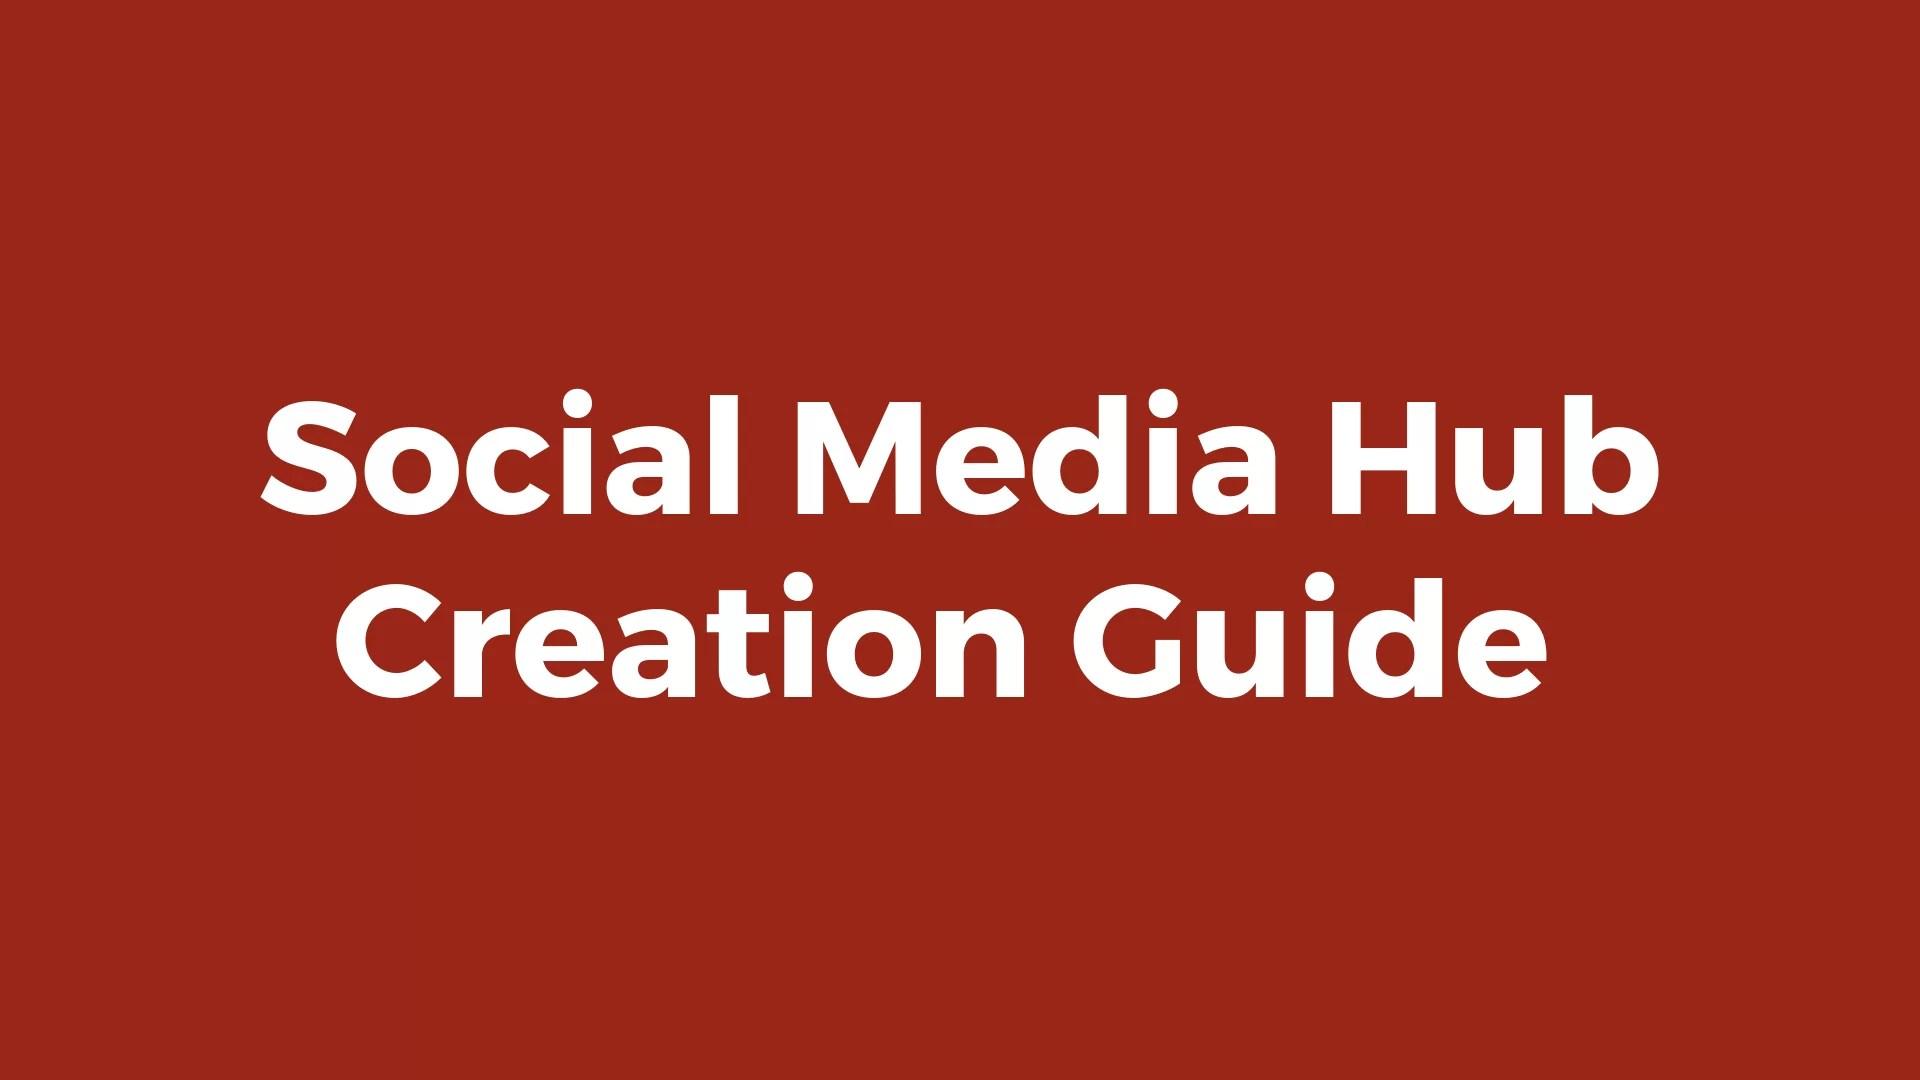 Social Media Hub Creation Guide